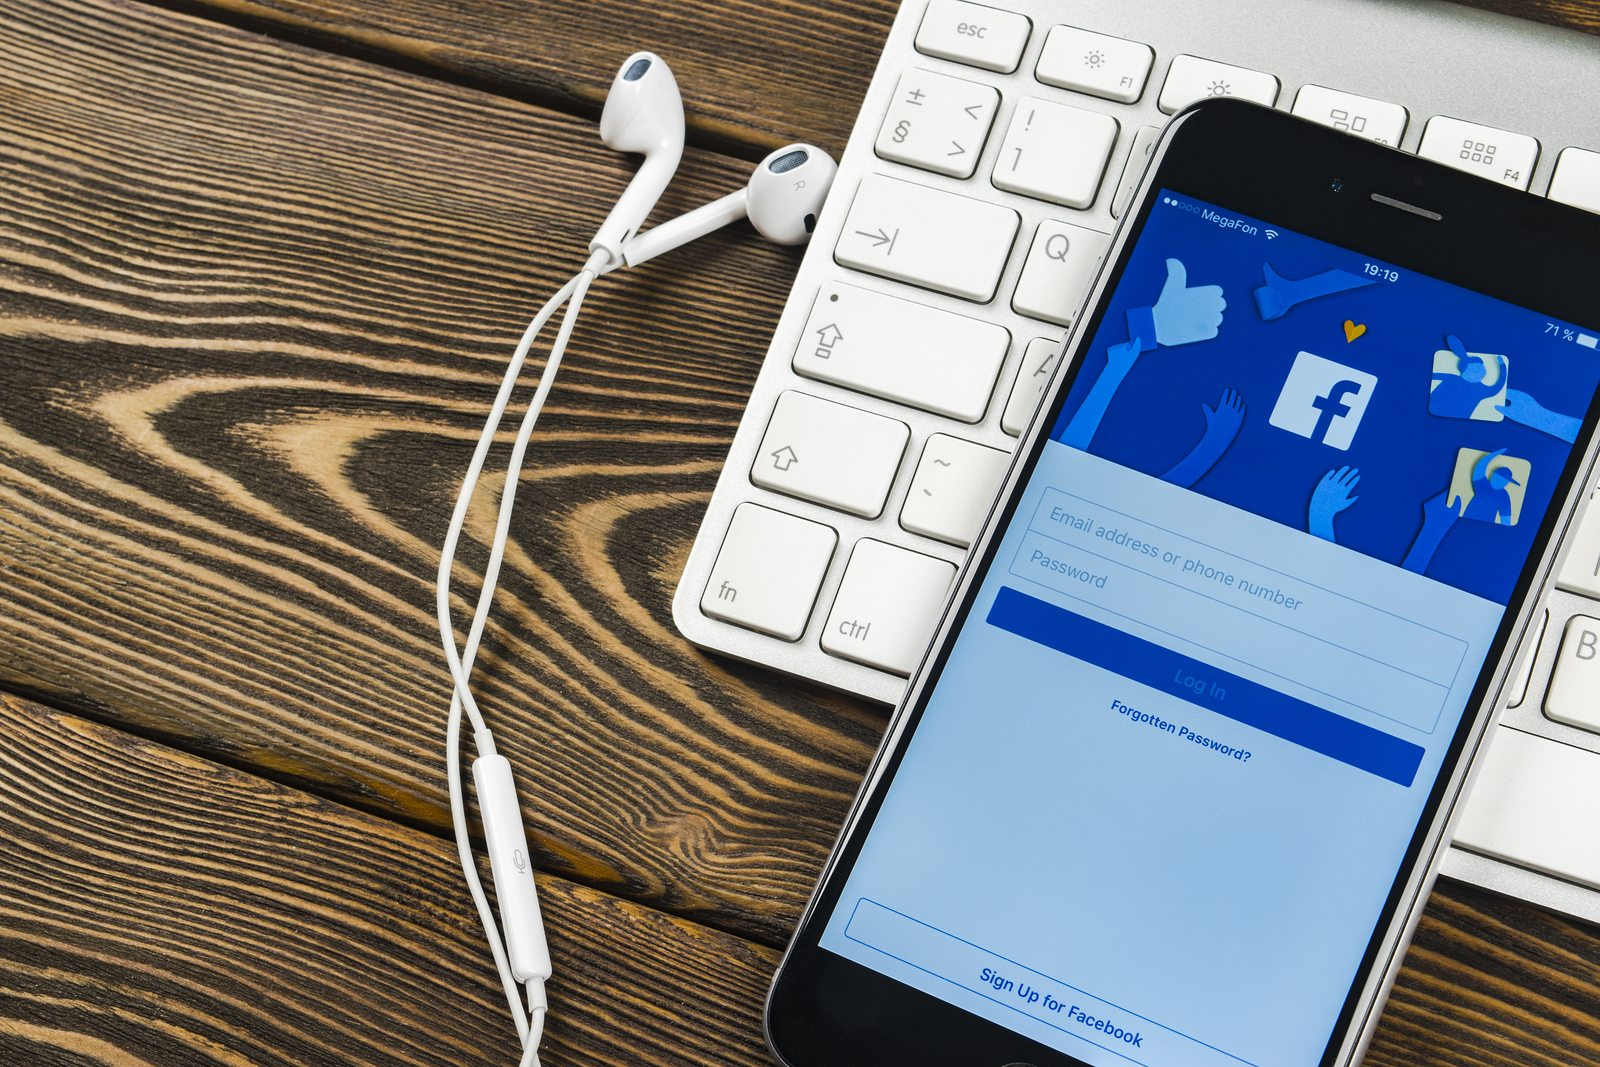 Facebook is facing a major data scandal